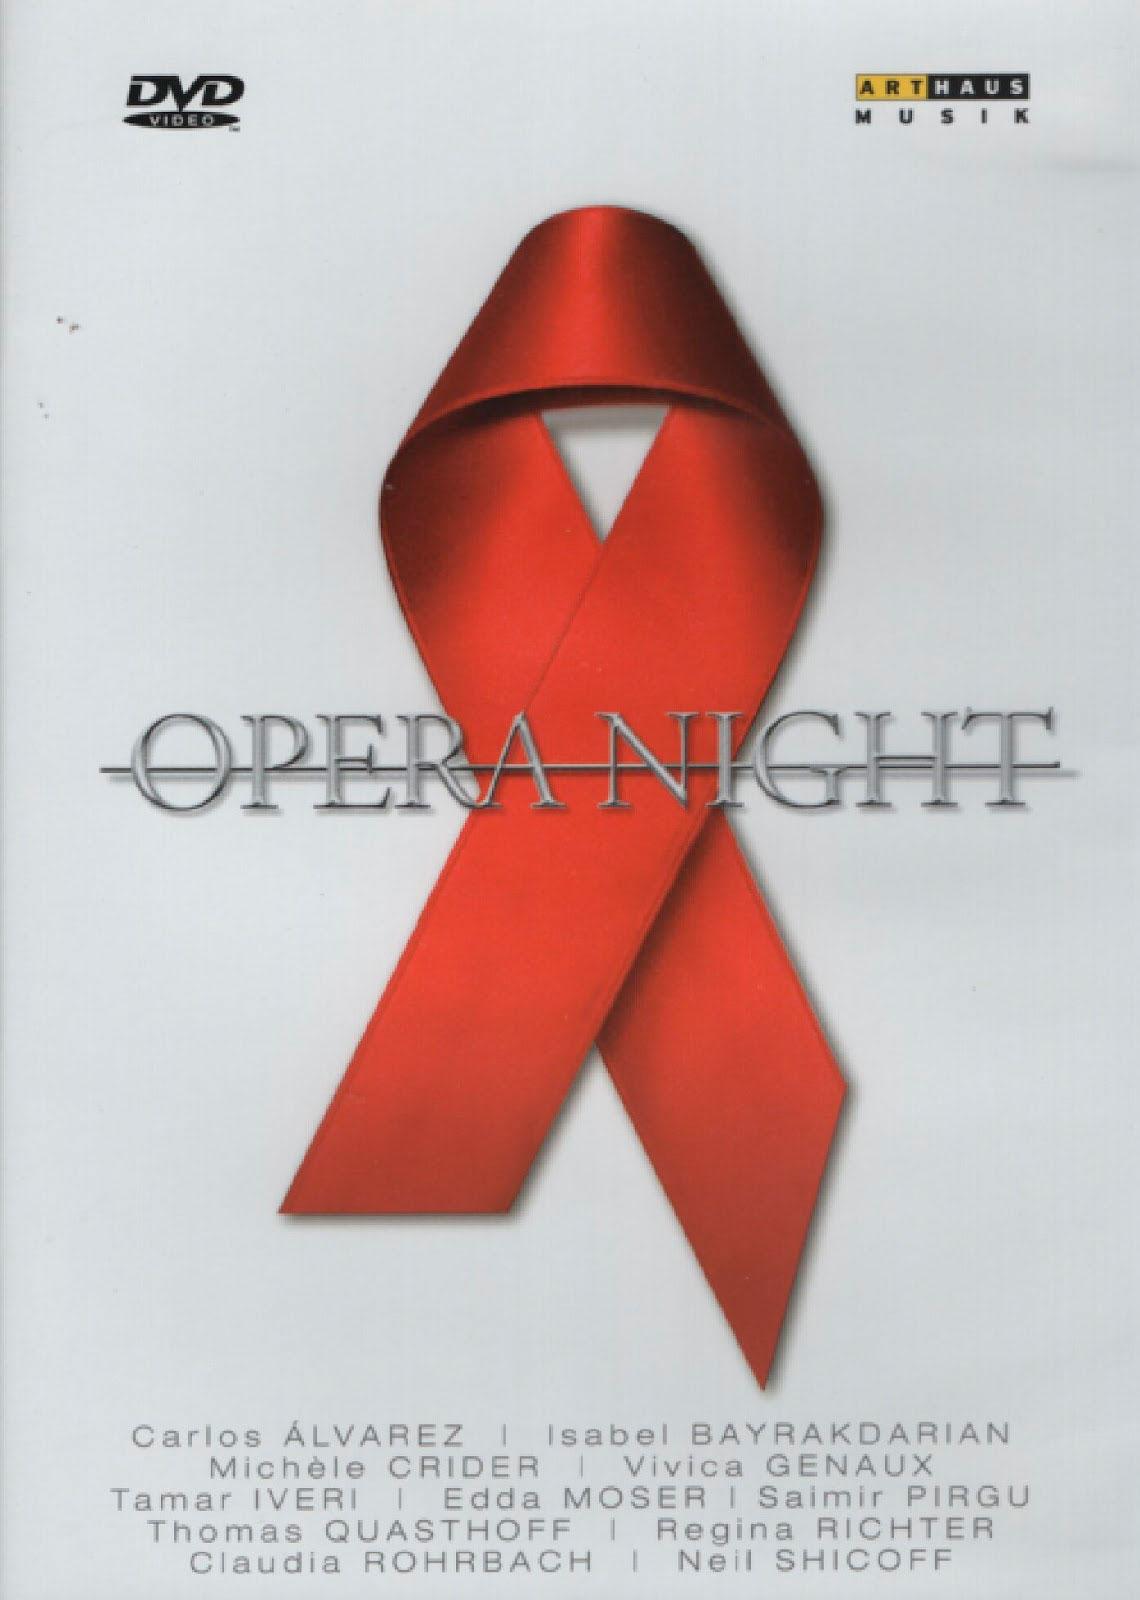 opera night deutsche oper berlin dvd cover